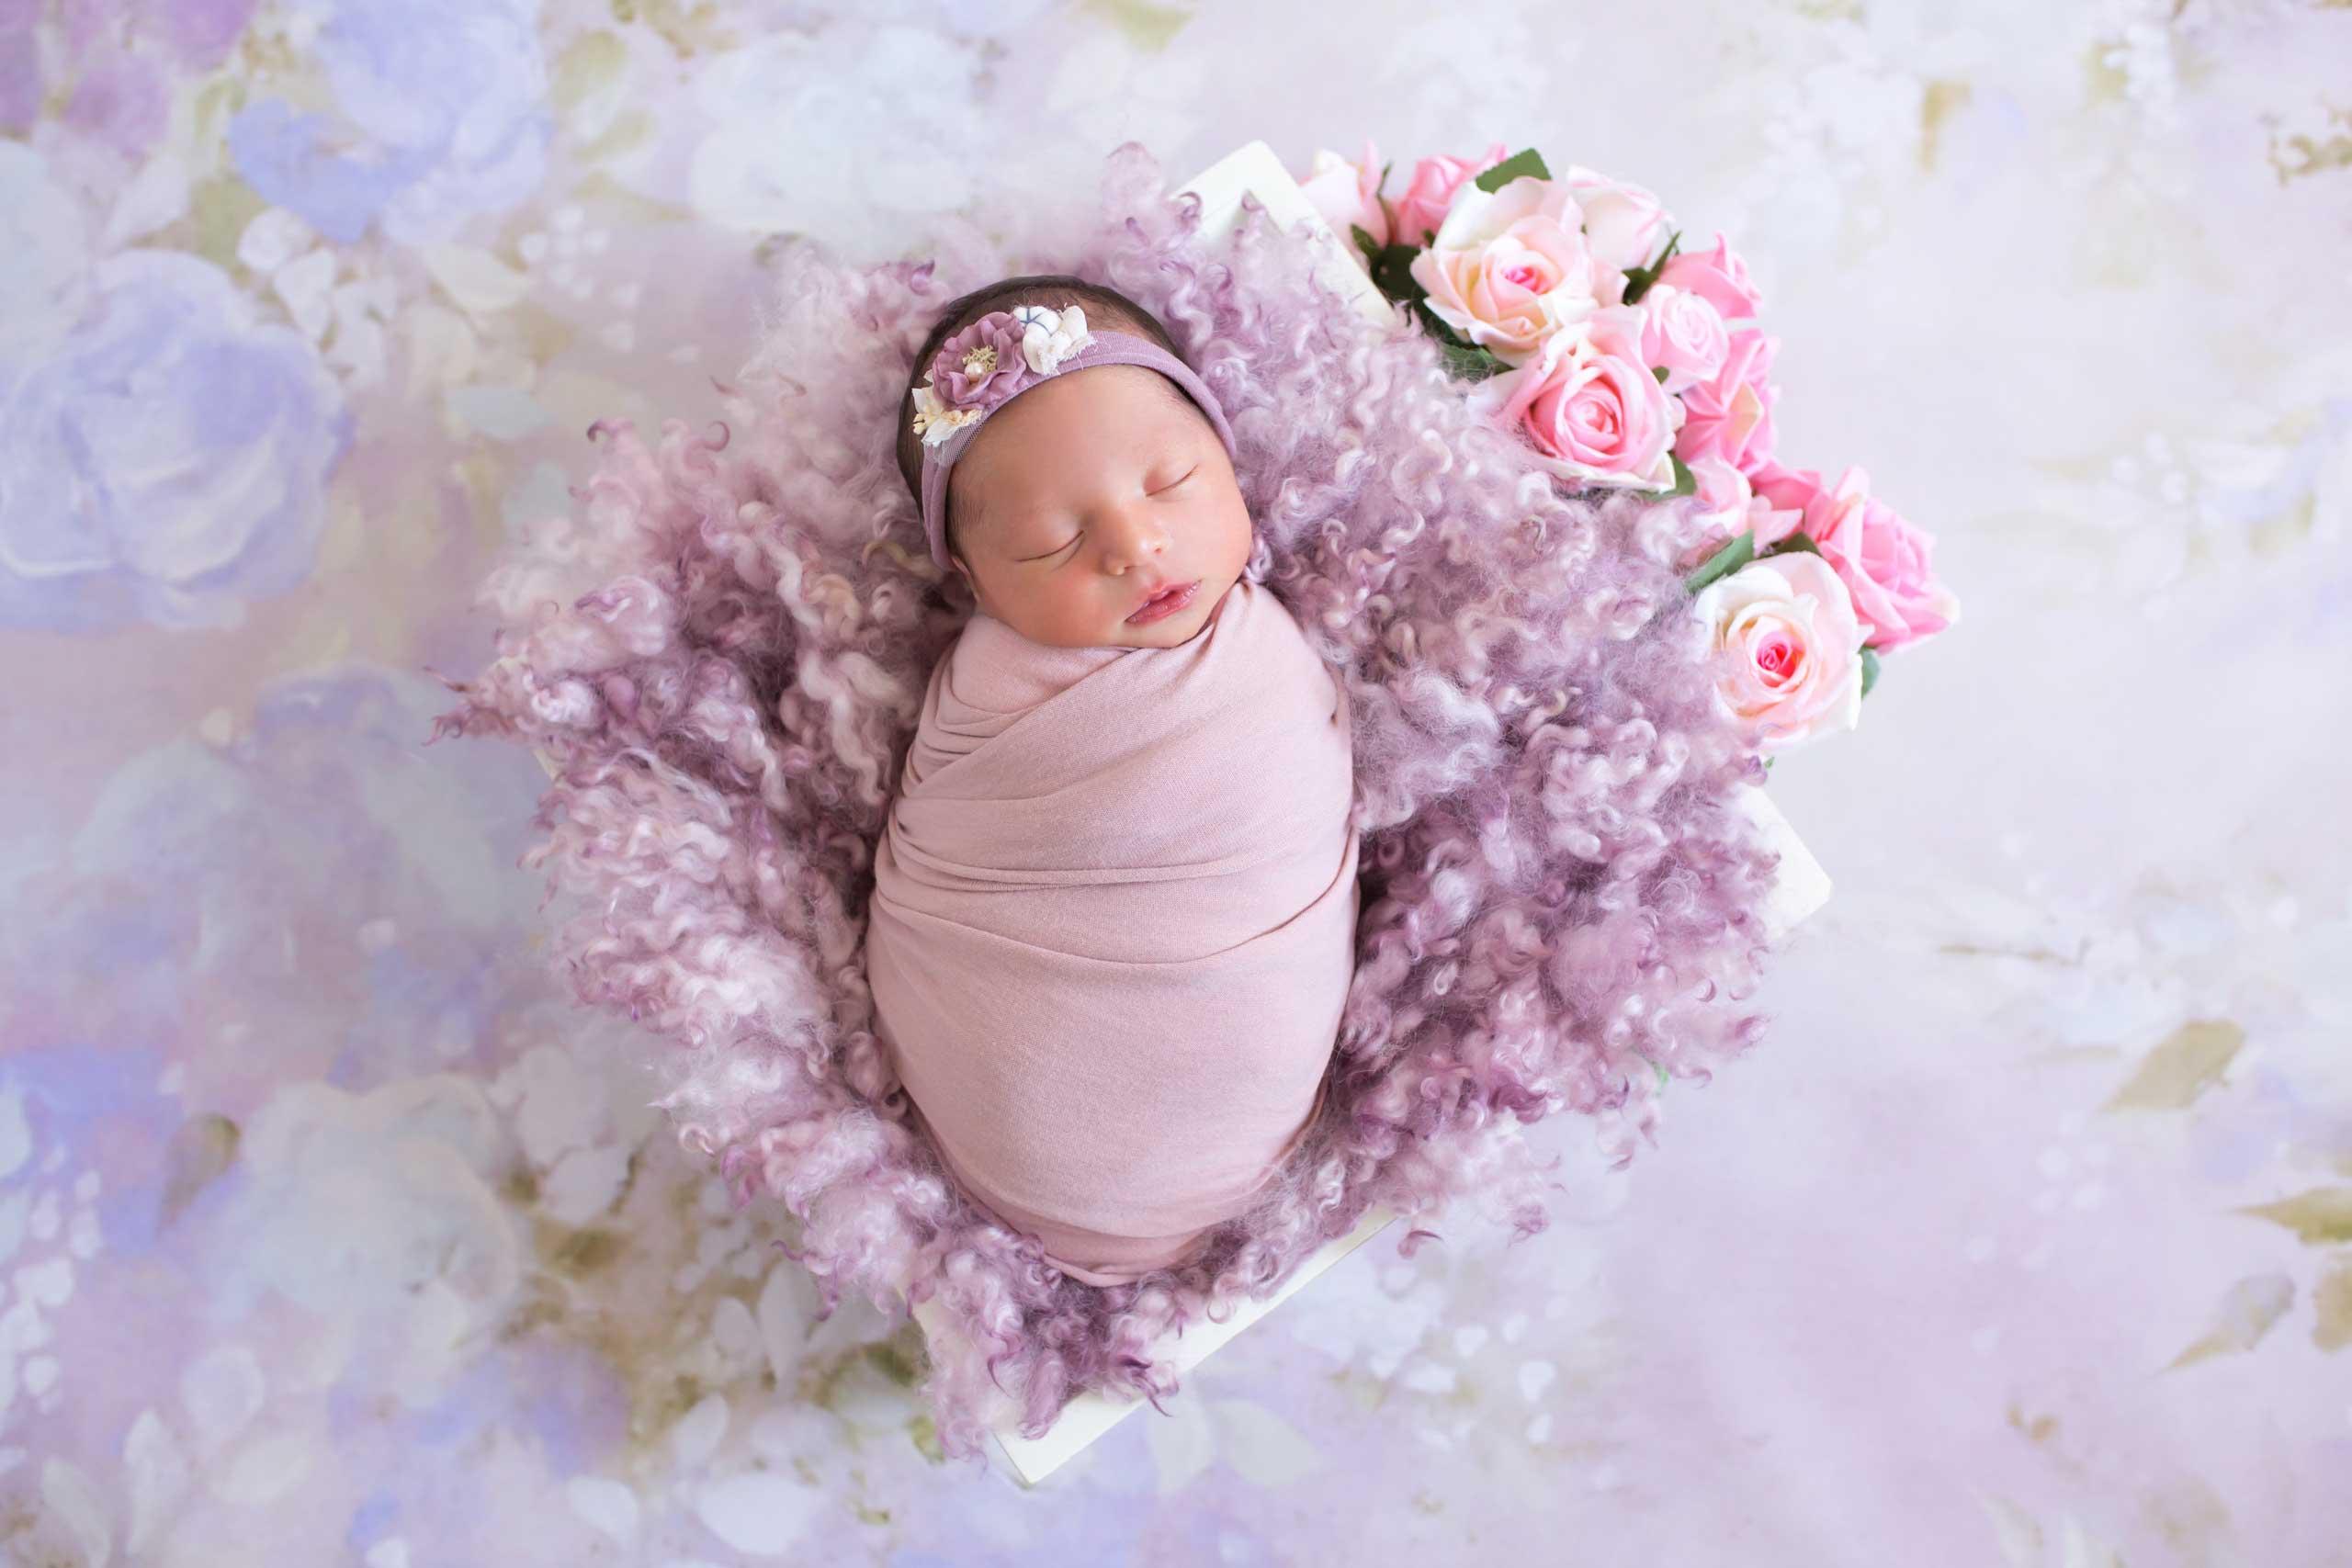 newborn baby photography los angeles ramina magid 19280